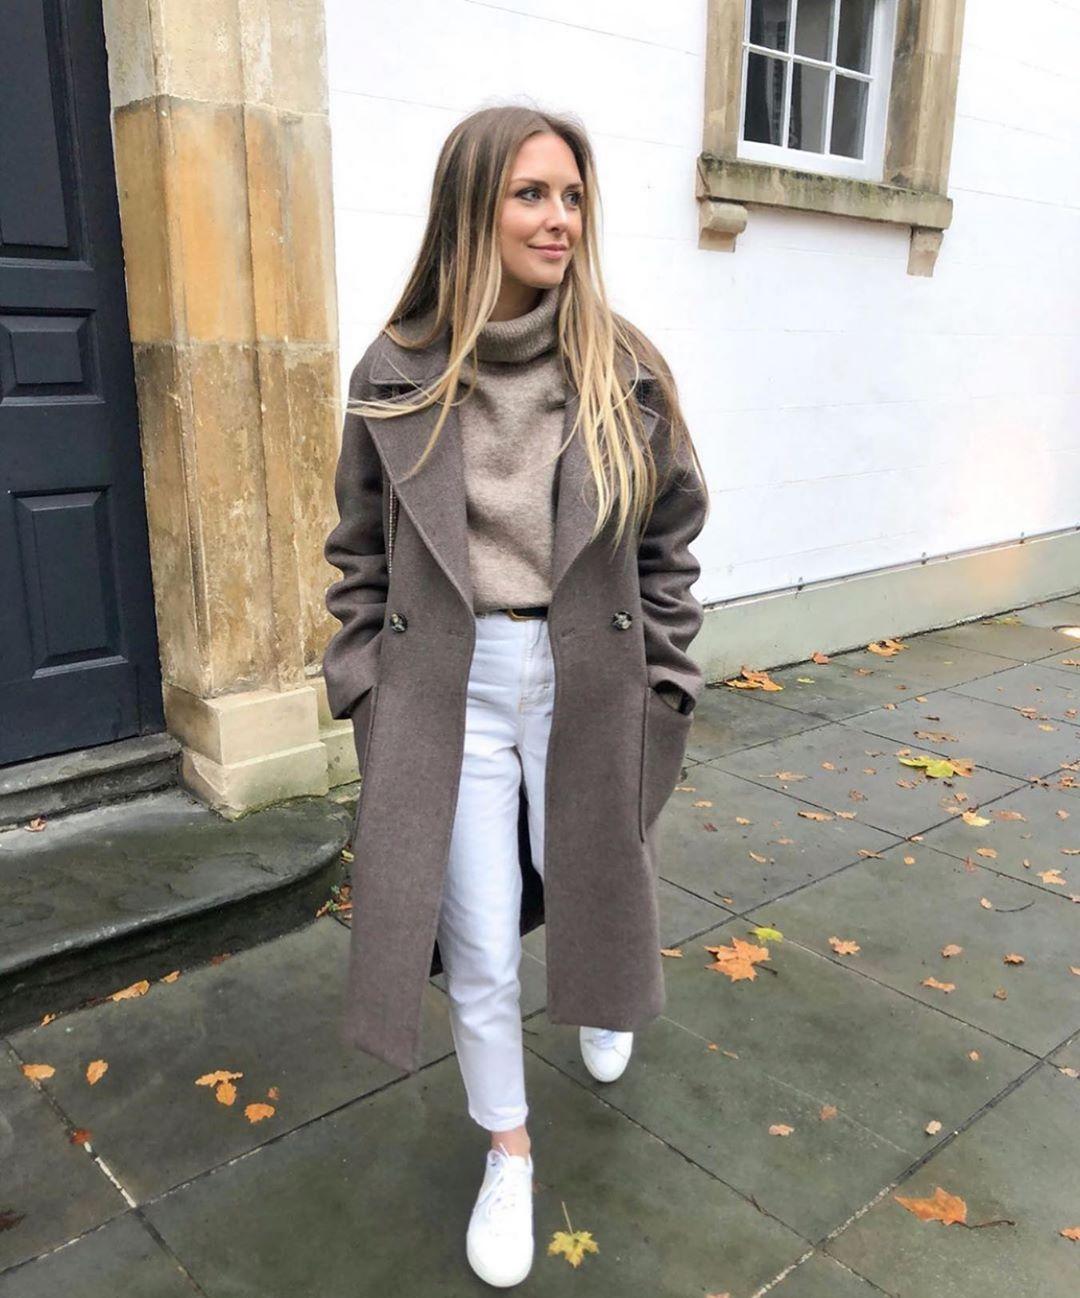 manteau xl à poches de Zara sur zara.outfits